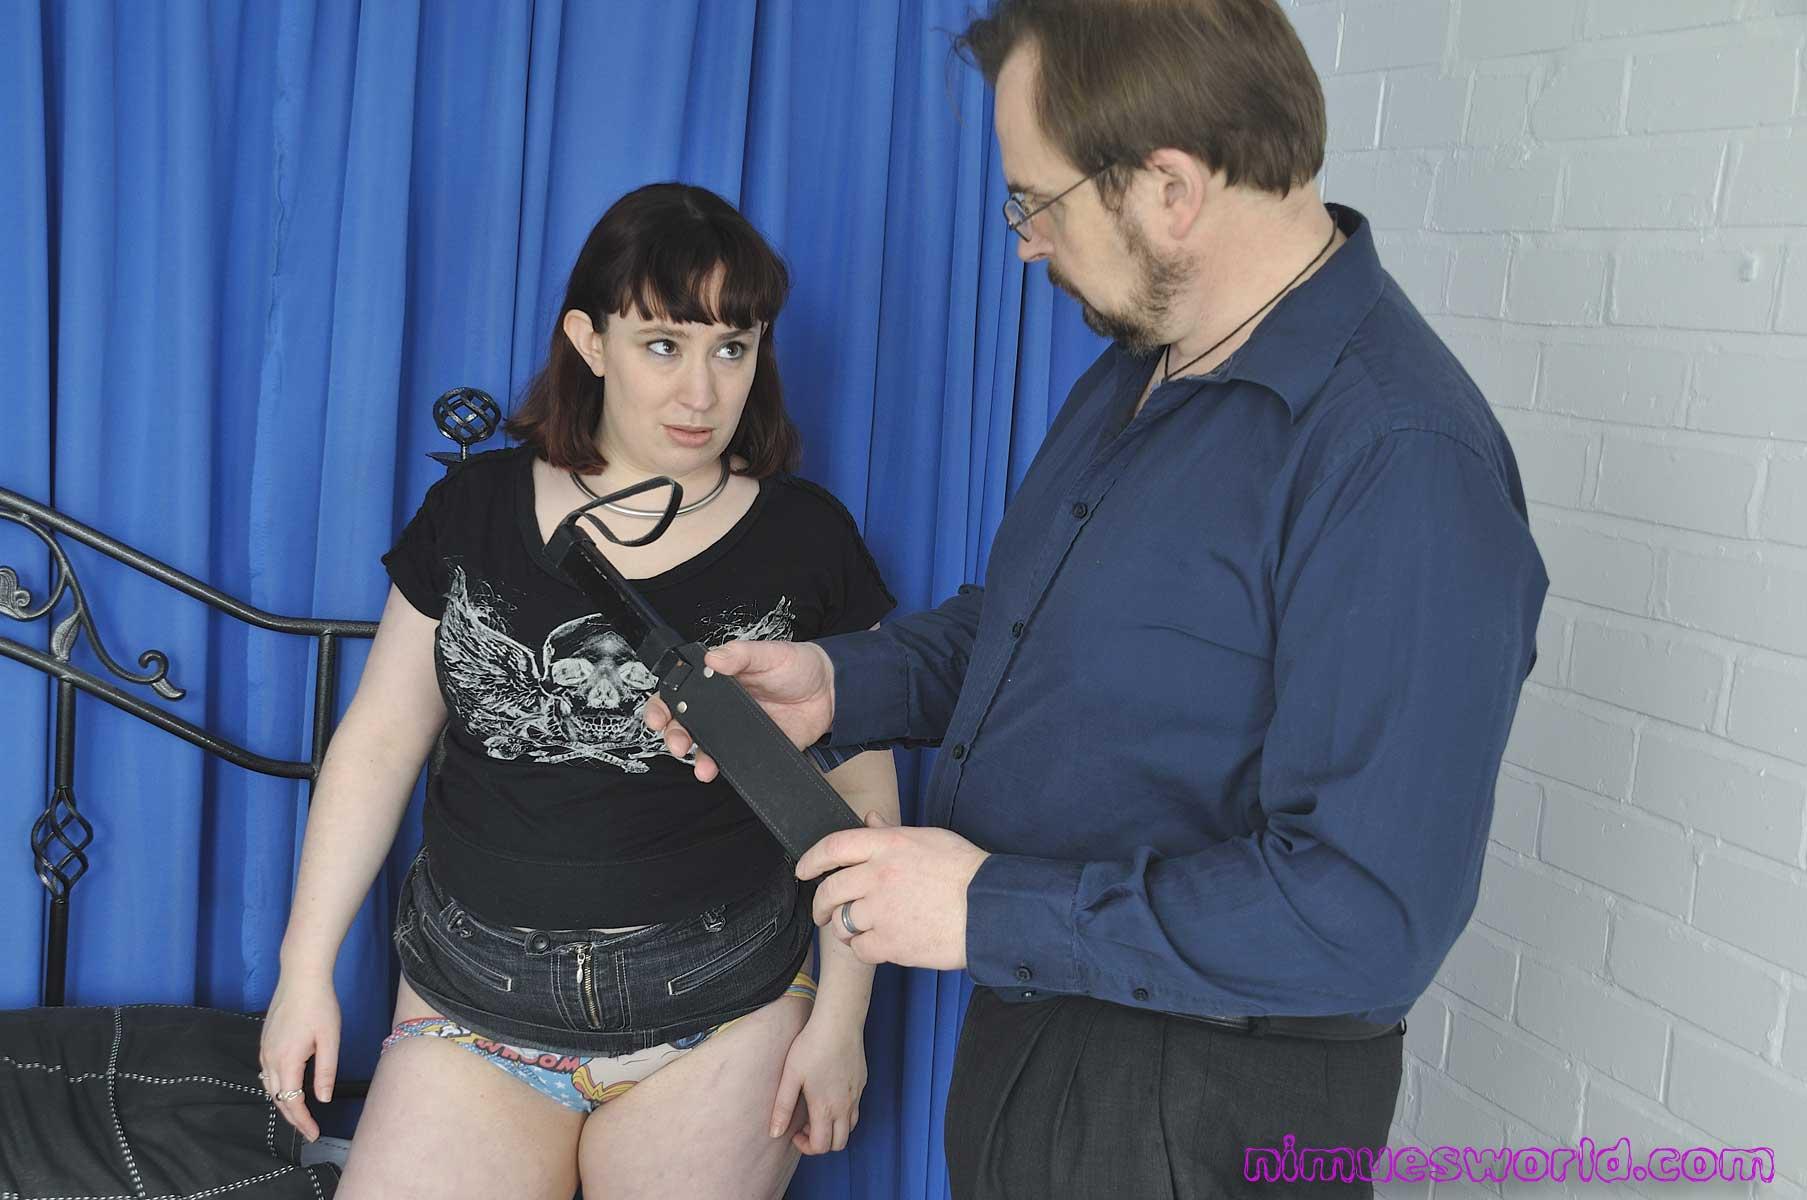 Erotic doctor examination